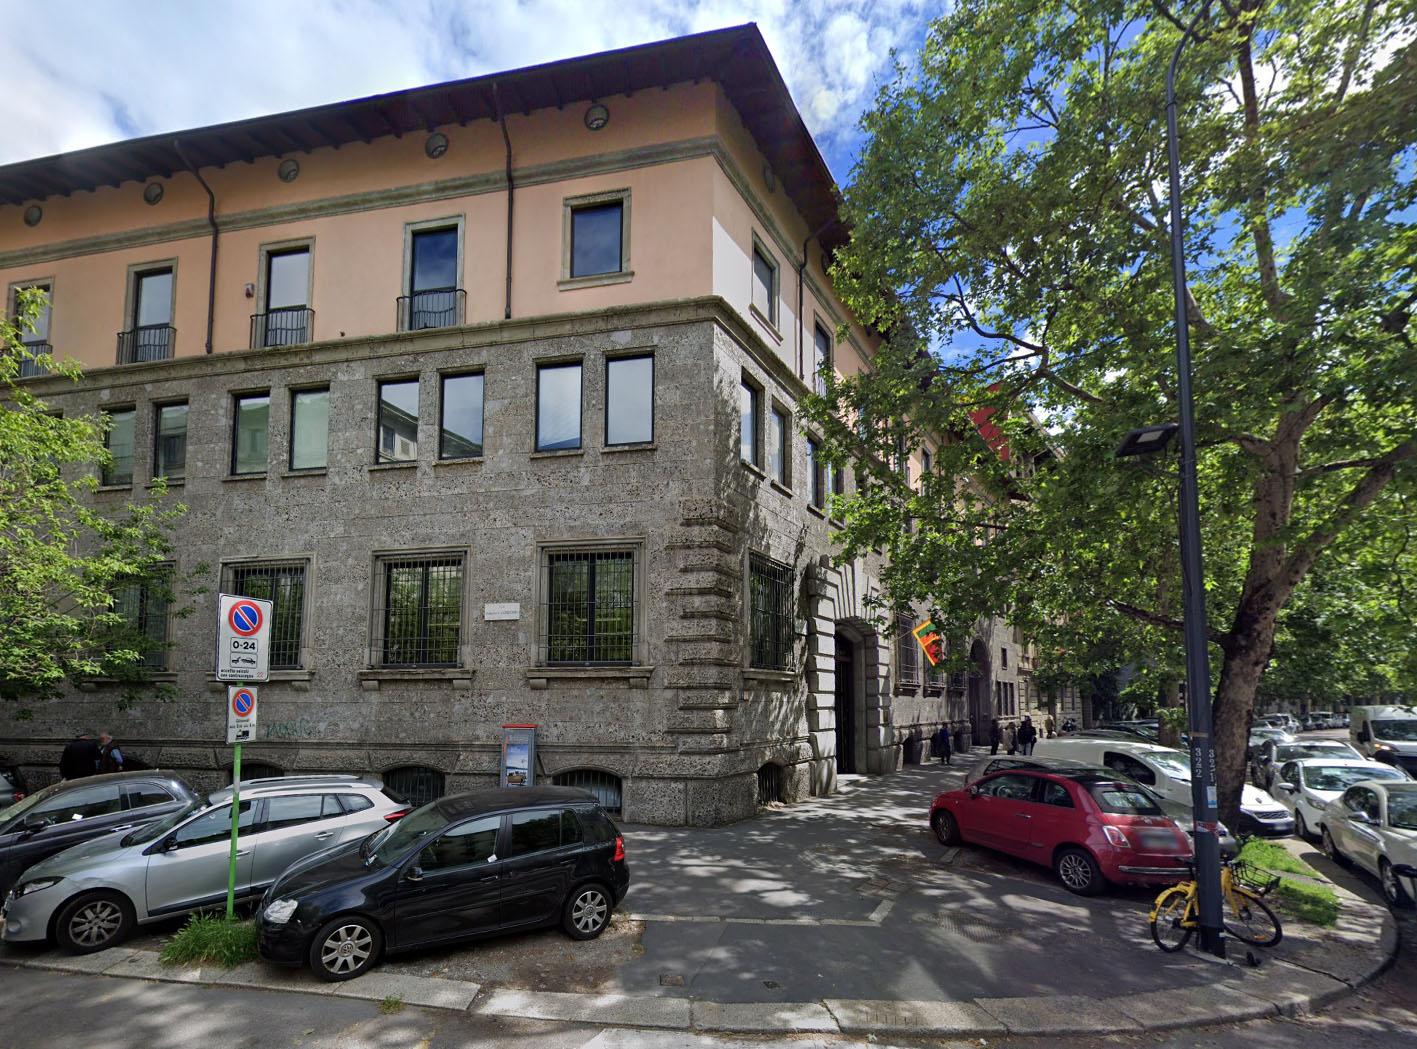 2020-10-28-Urbanfile-Milano-Sempione-Via-Melzi-DEril-34-1.jpg